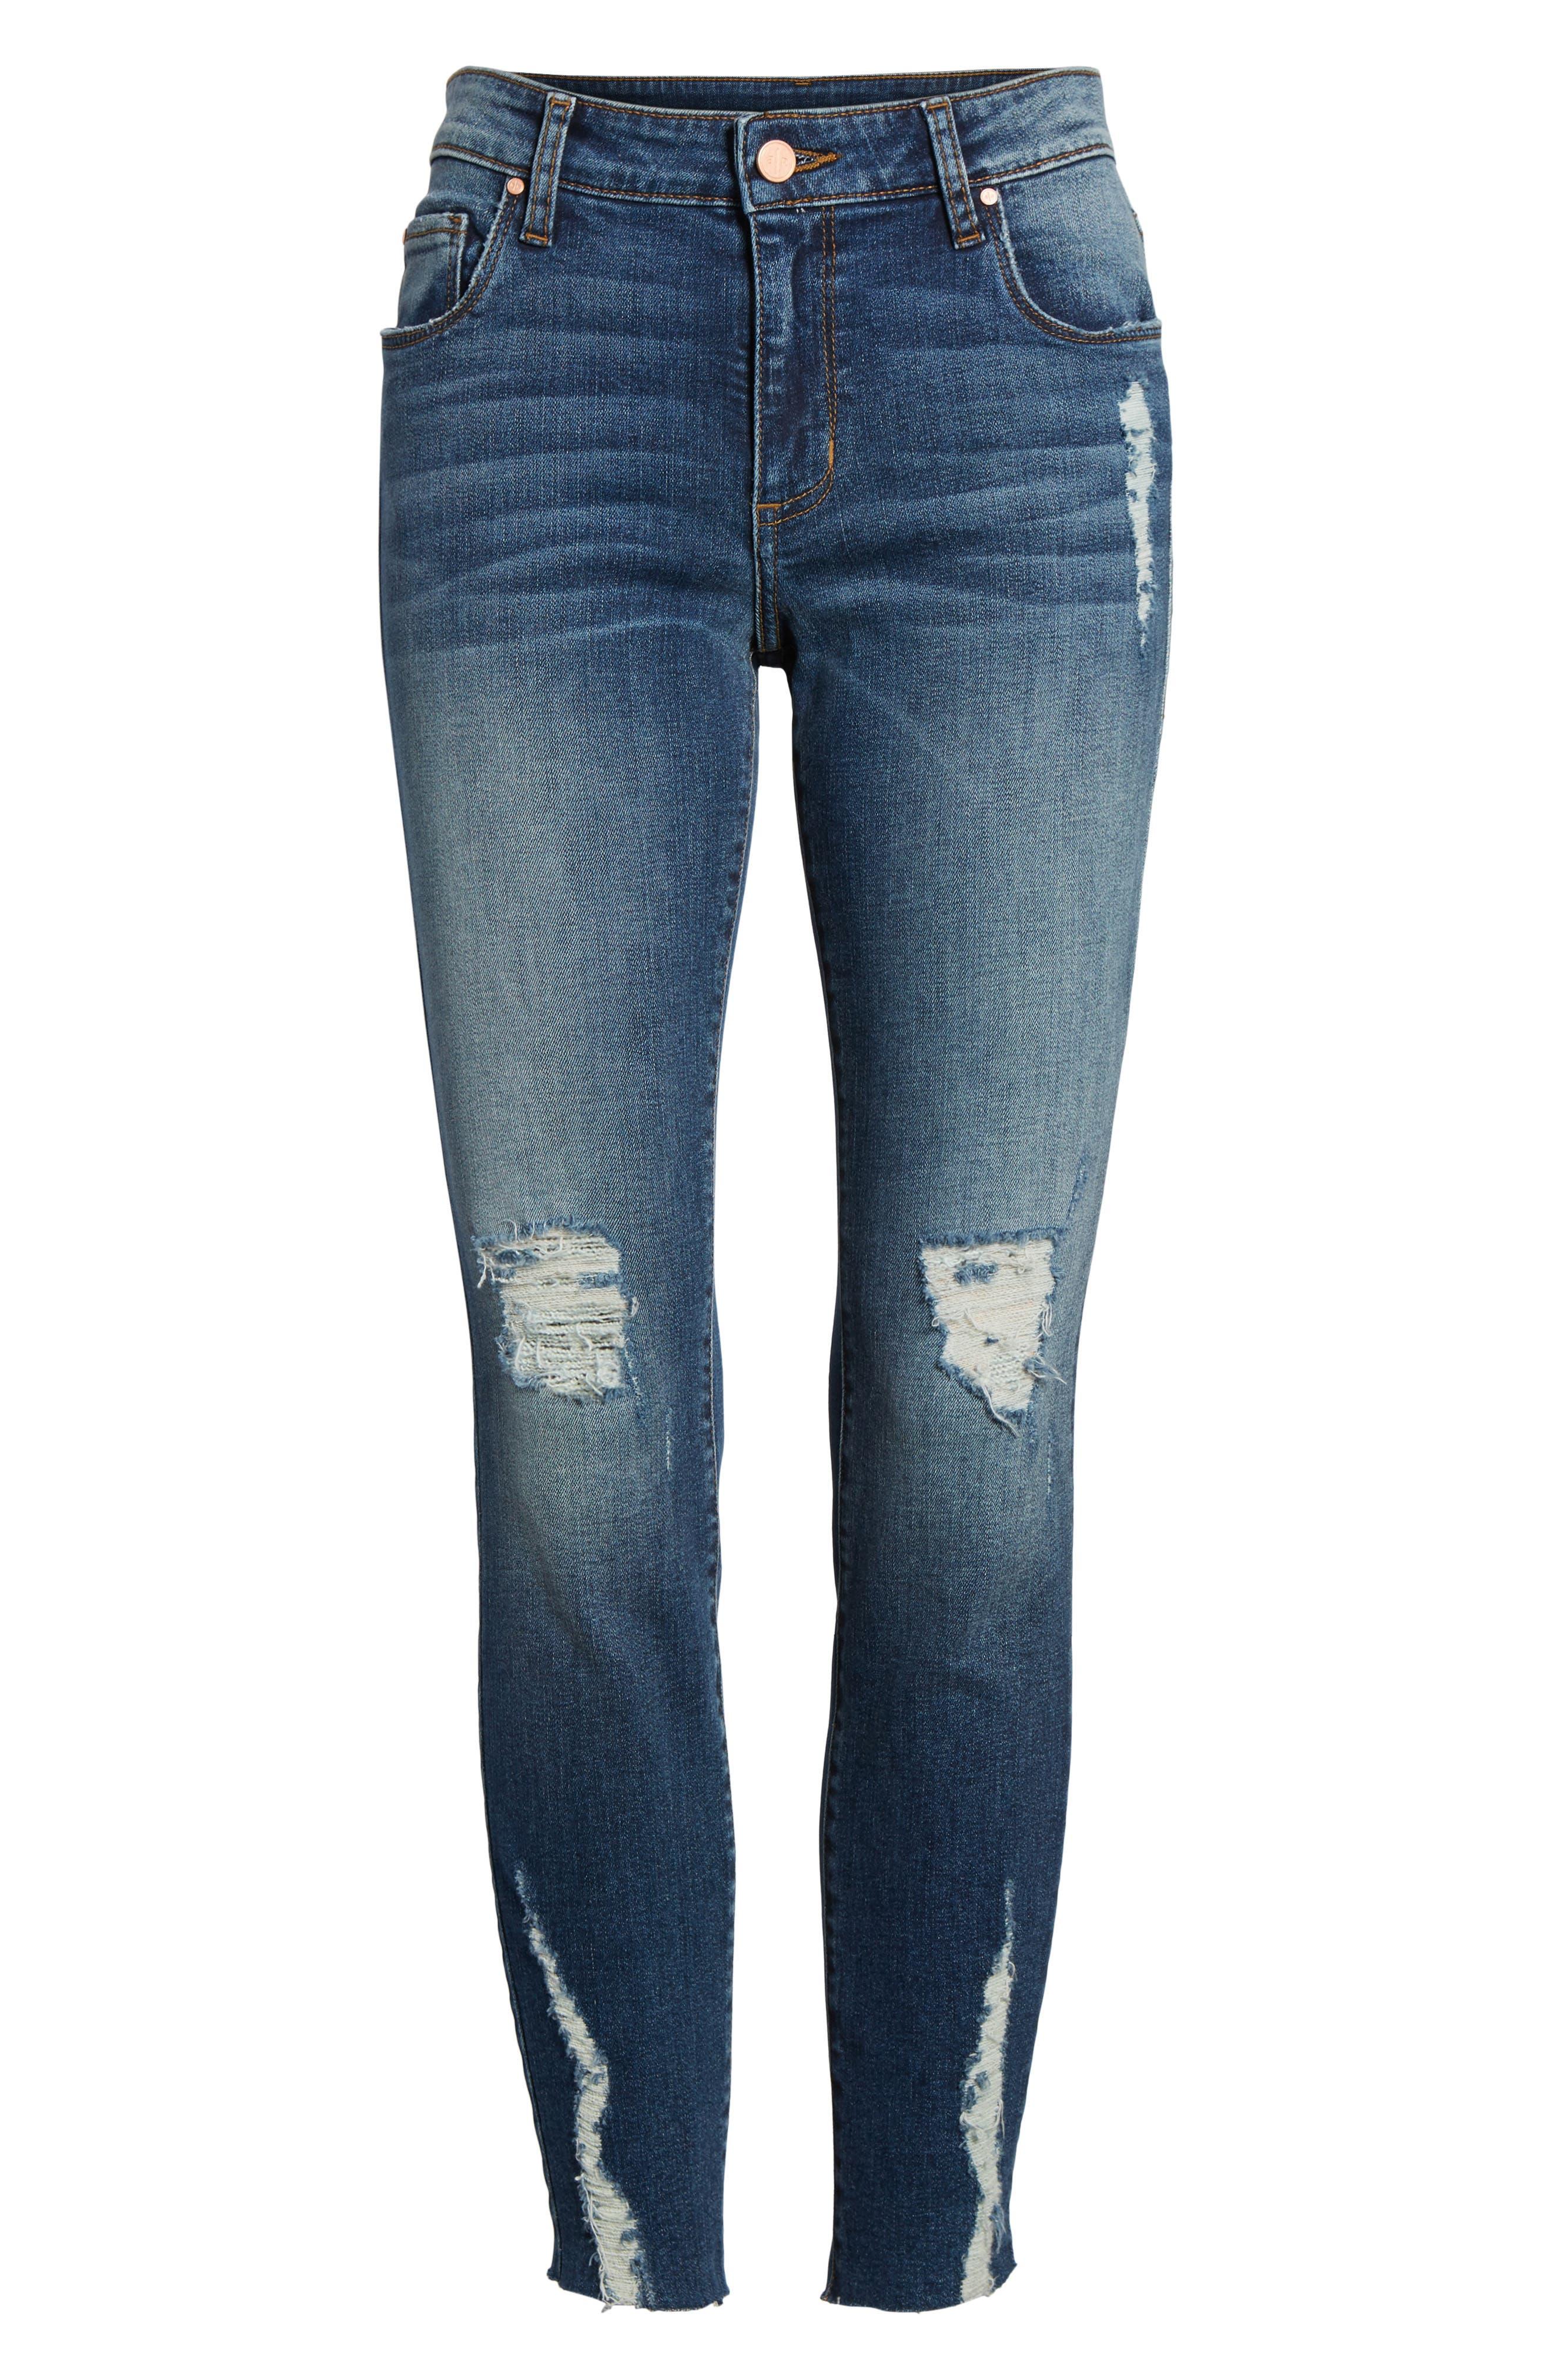 Decon Distressed Skinny Jeans,                             Alternate thumbnail 6, color,                             Vintage